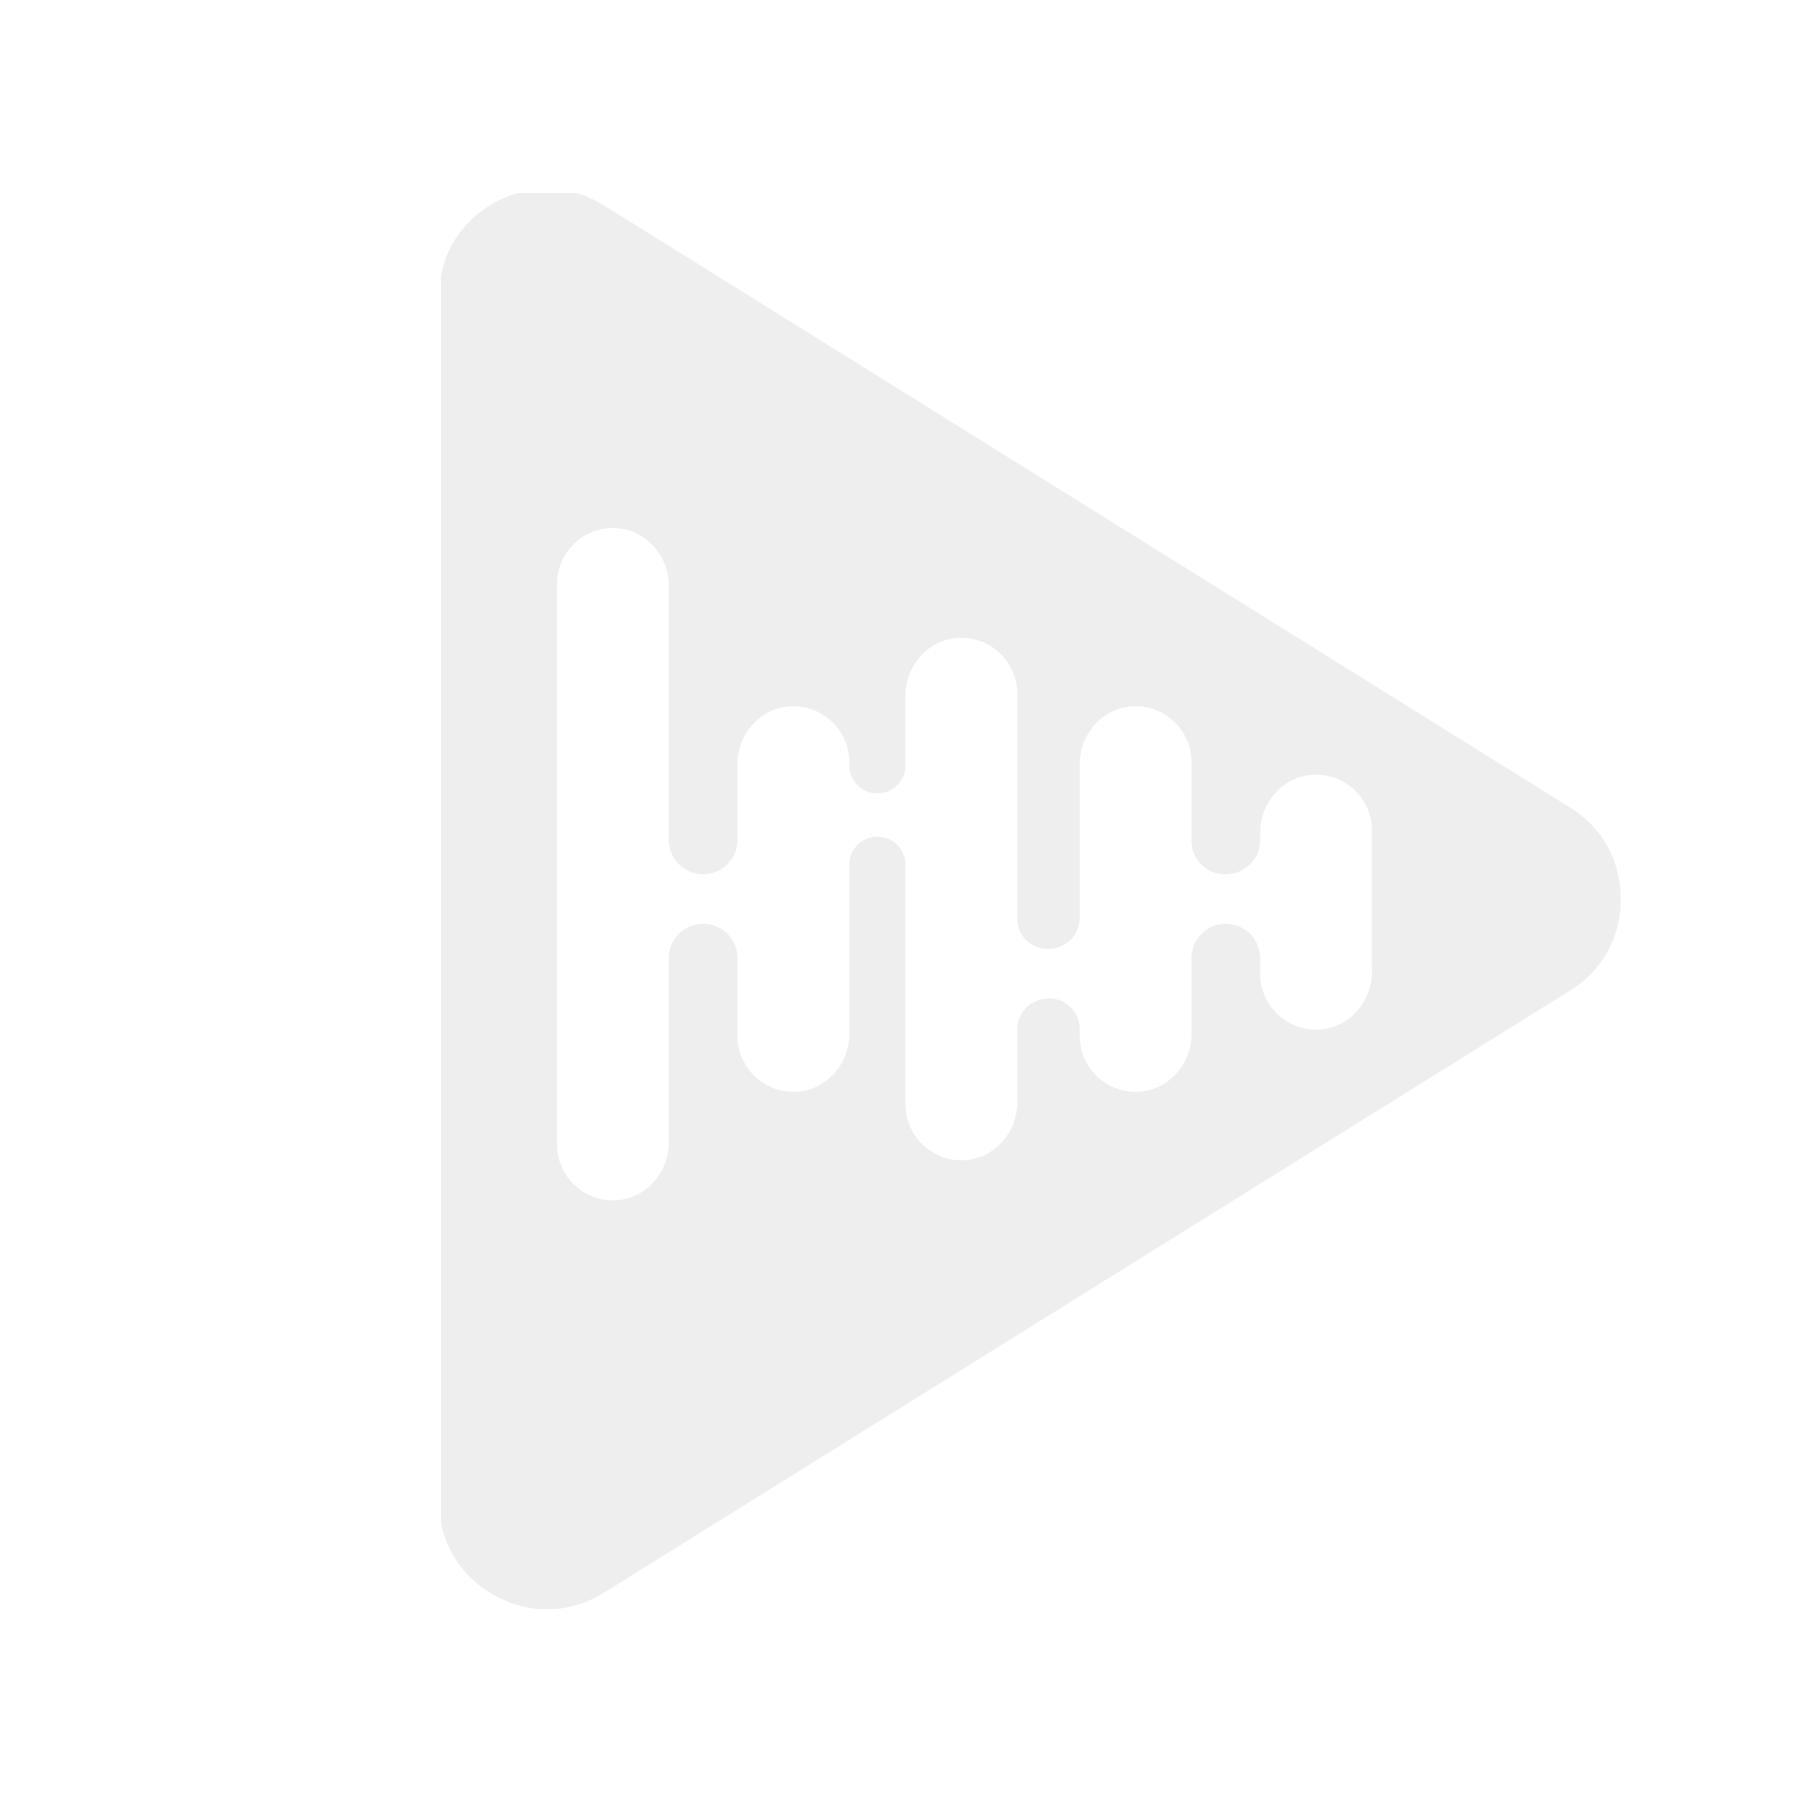 Dension DBR1GEN - DAB-integrering, RF-fjernkontroll/FM-modulering